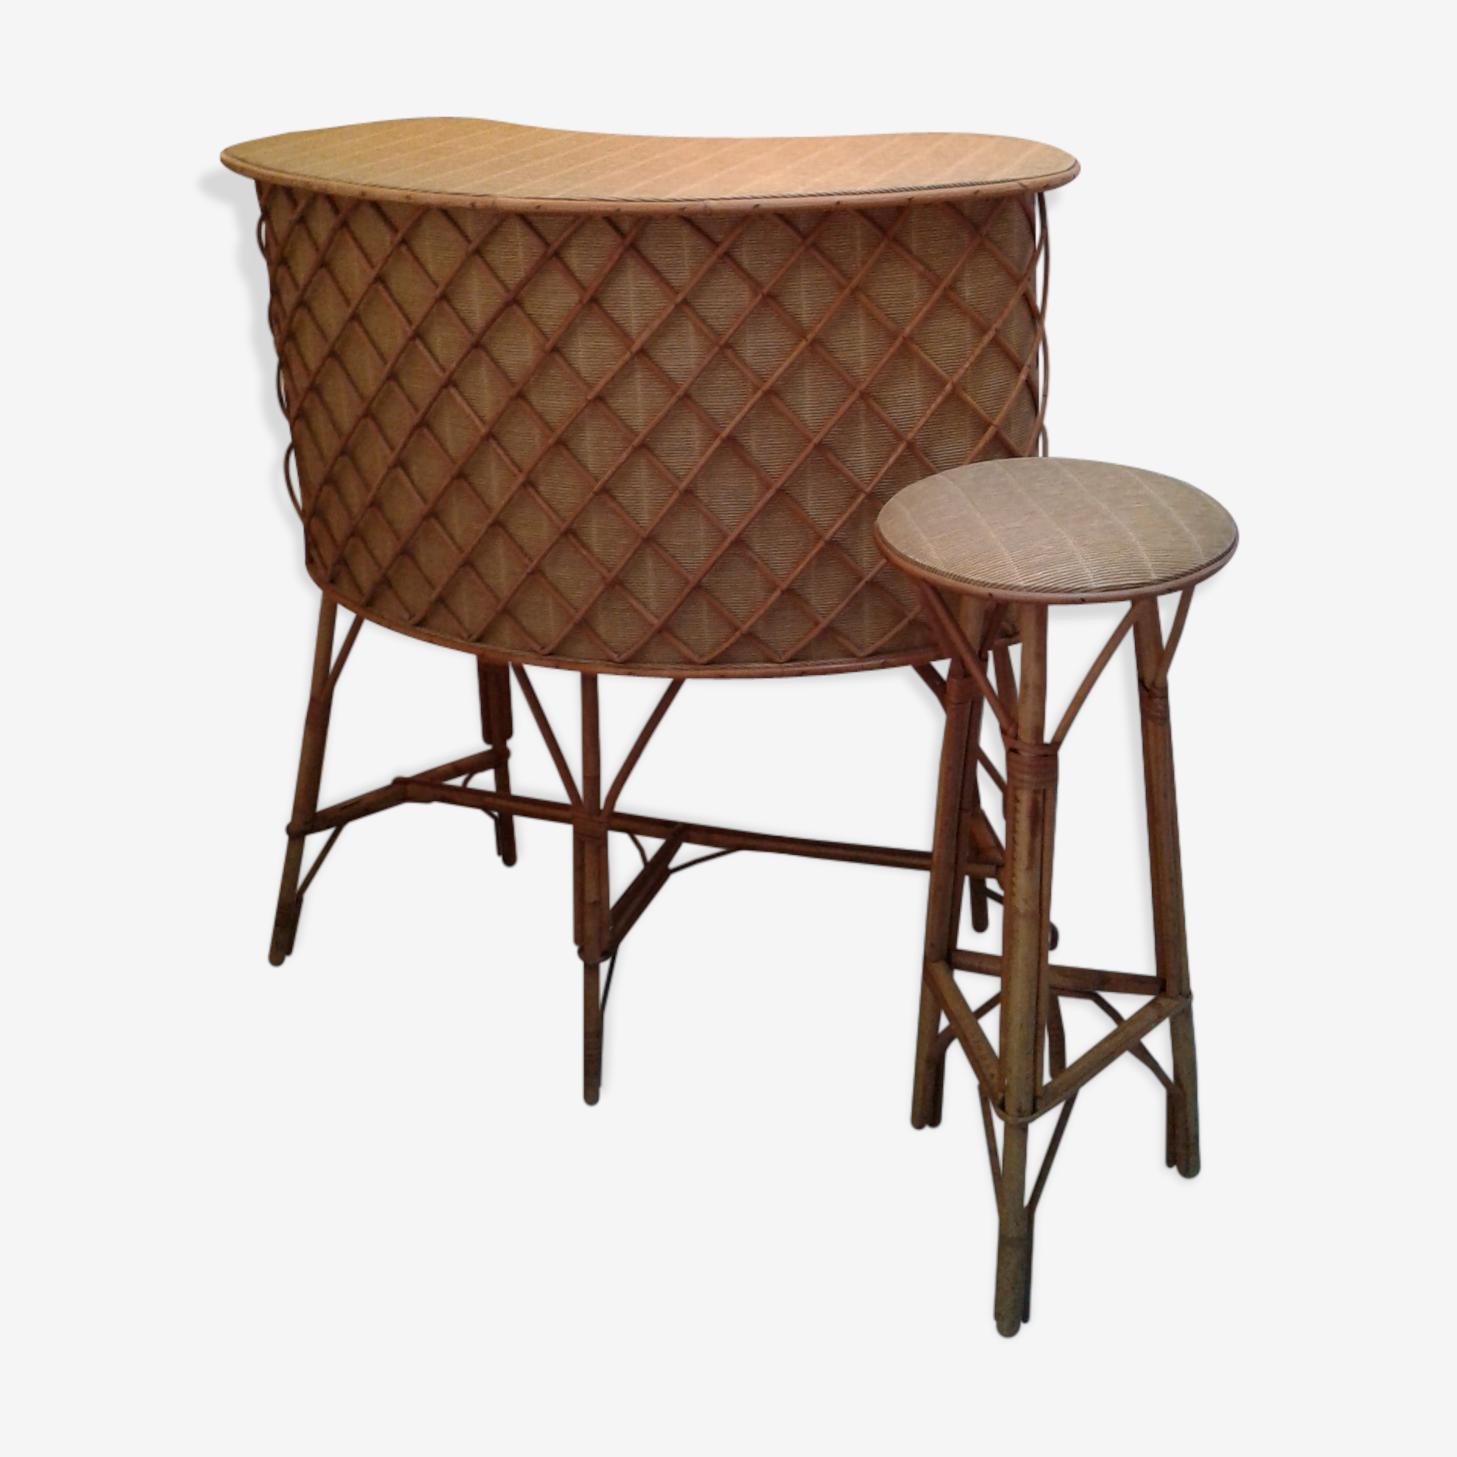 Bar and his stool 60s rattan